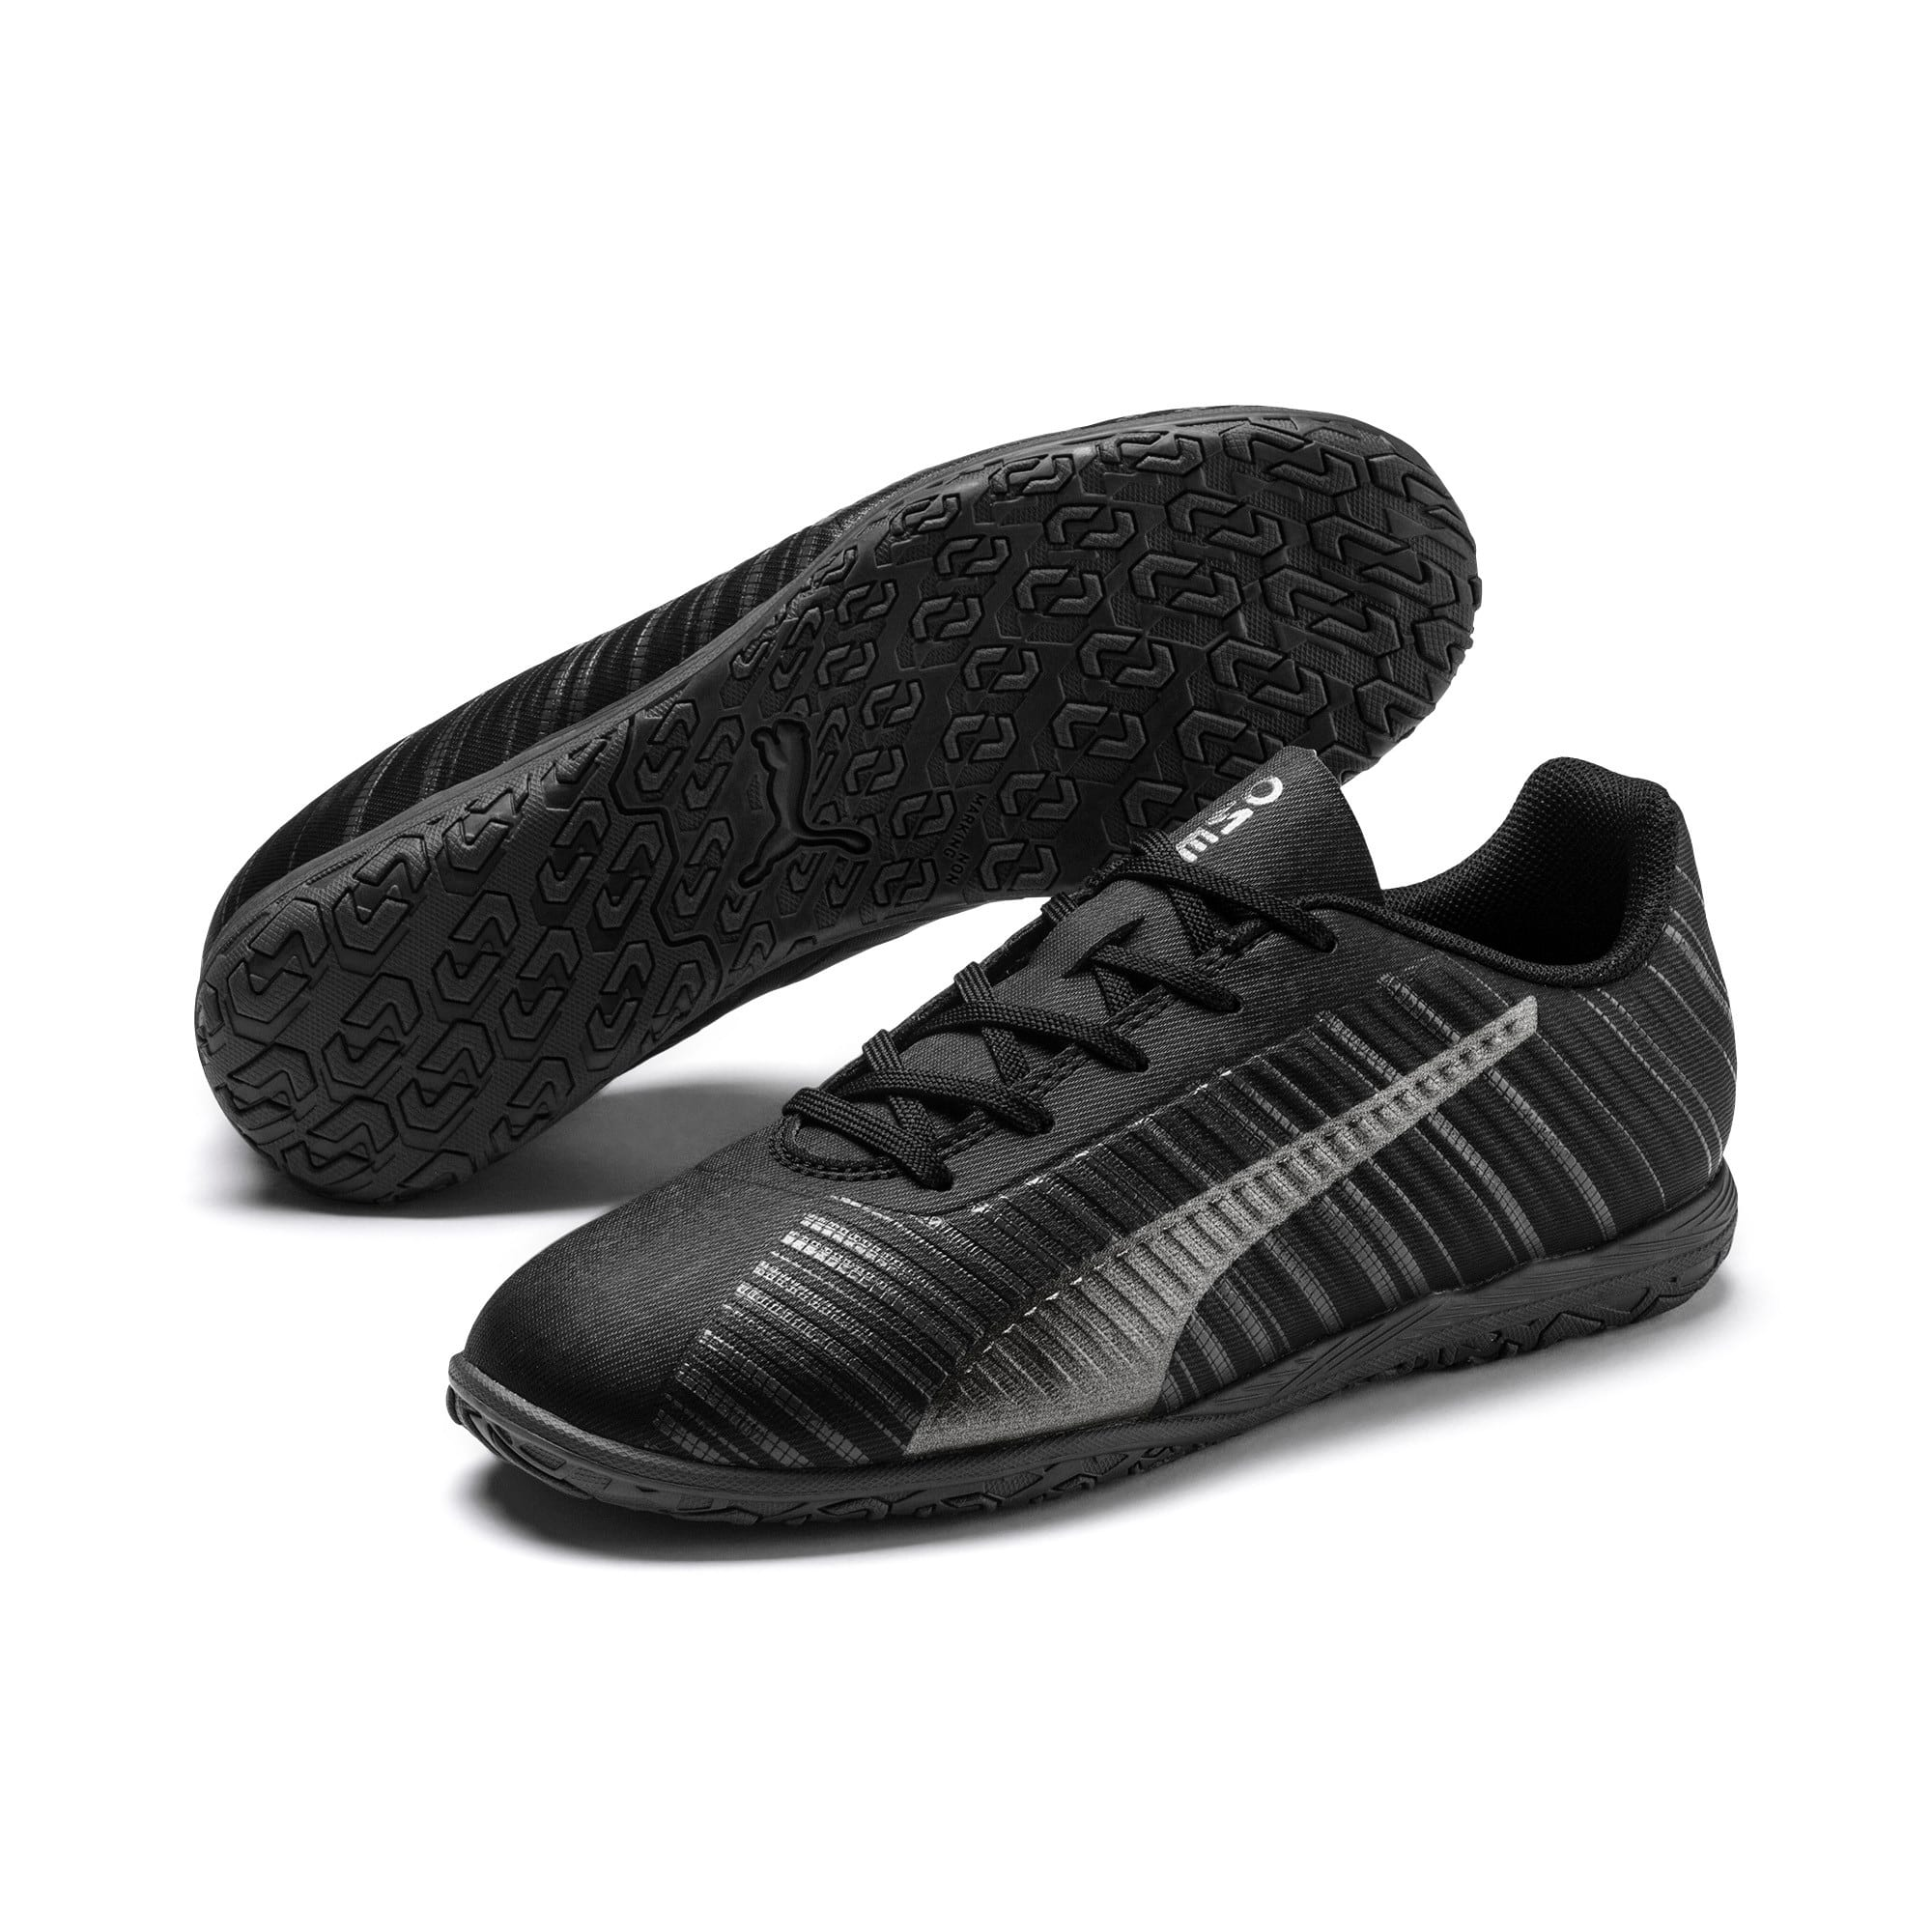 Thumbnail 2 of PUMA ONE 5.4 IT Soccer Shoes JR, Black-Black-Puma Aged Silver, medium